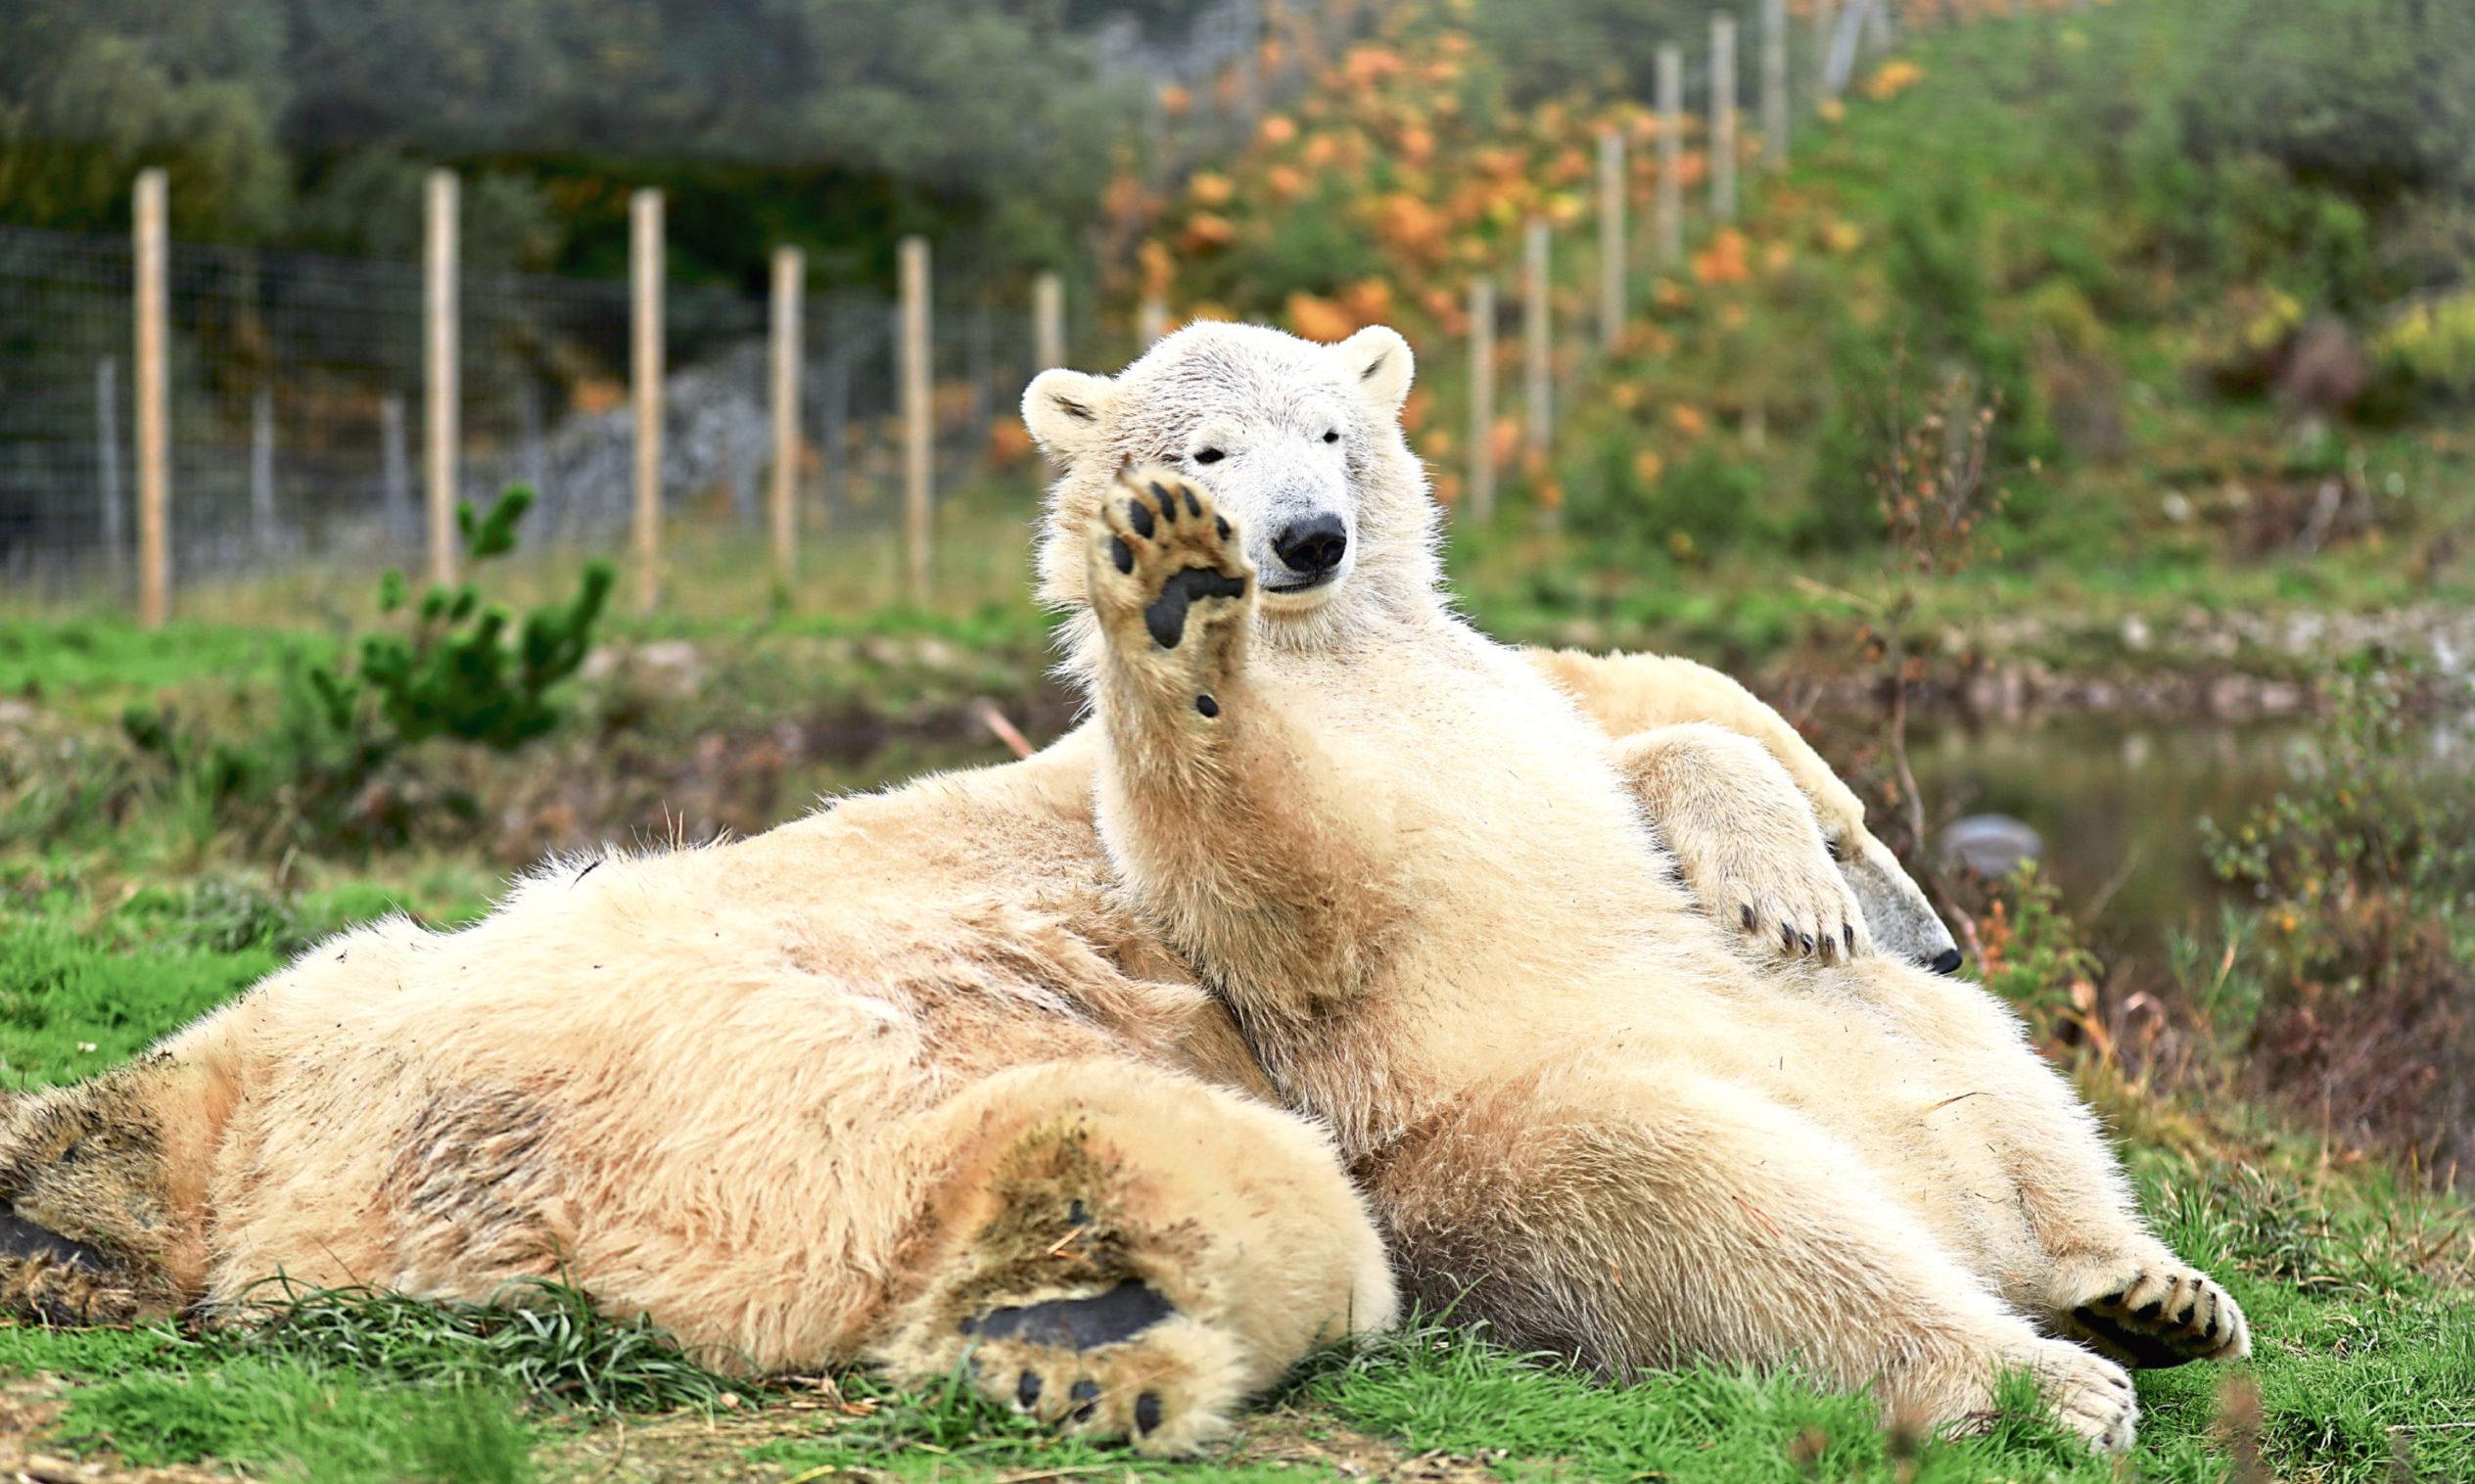 Hamish the polar bear at Highland Wildlife Park in October 2018.